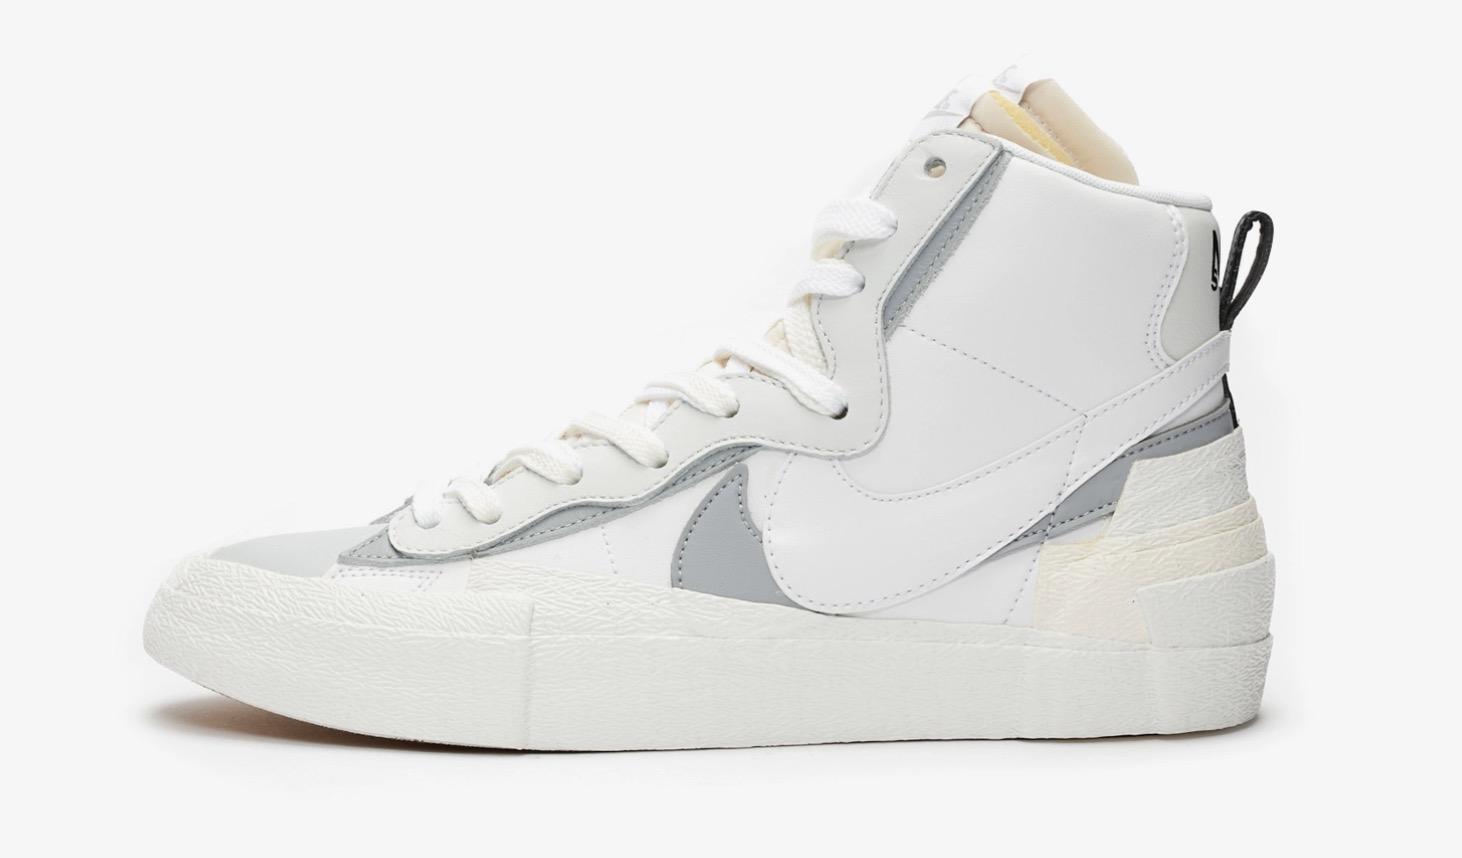 sacai x Nike Blazer Mid White | BV0072-100 1 side